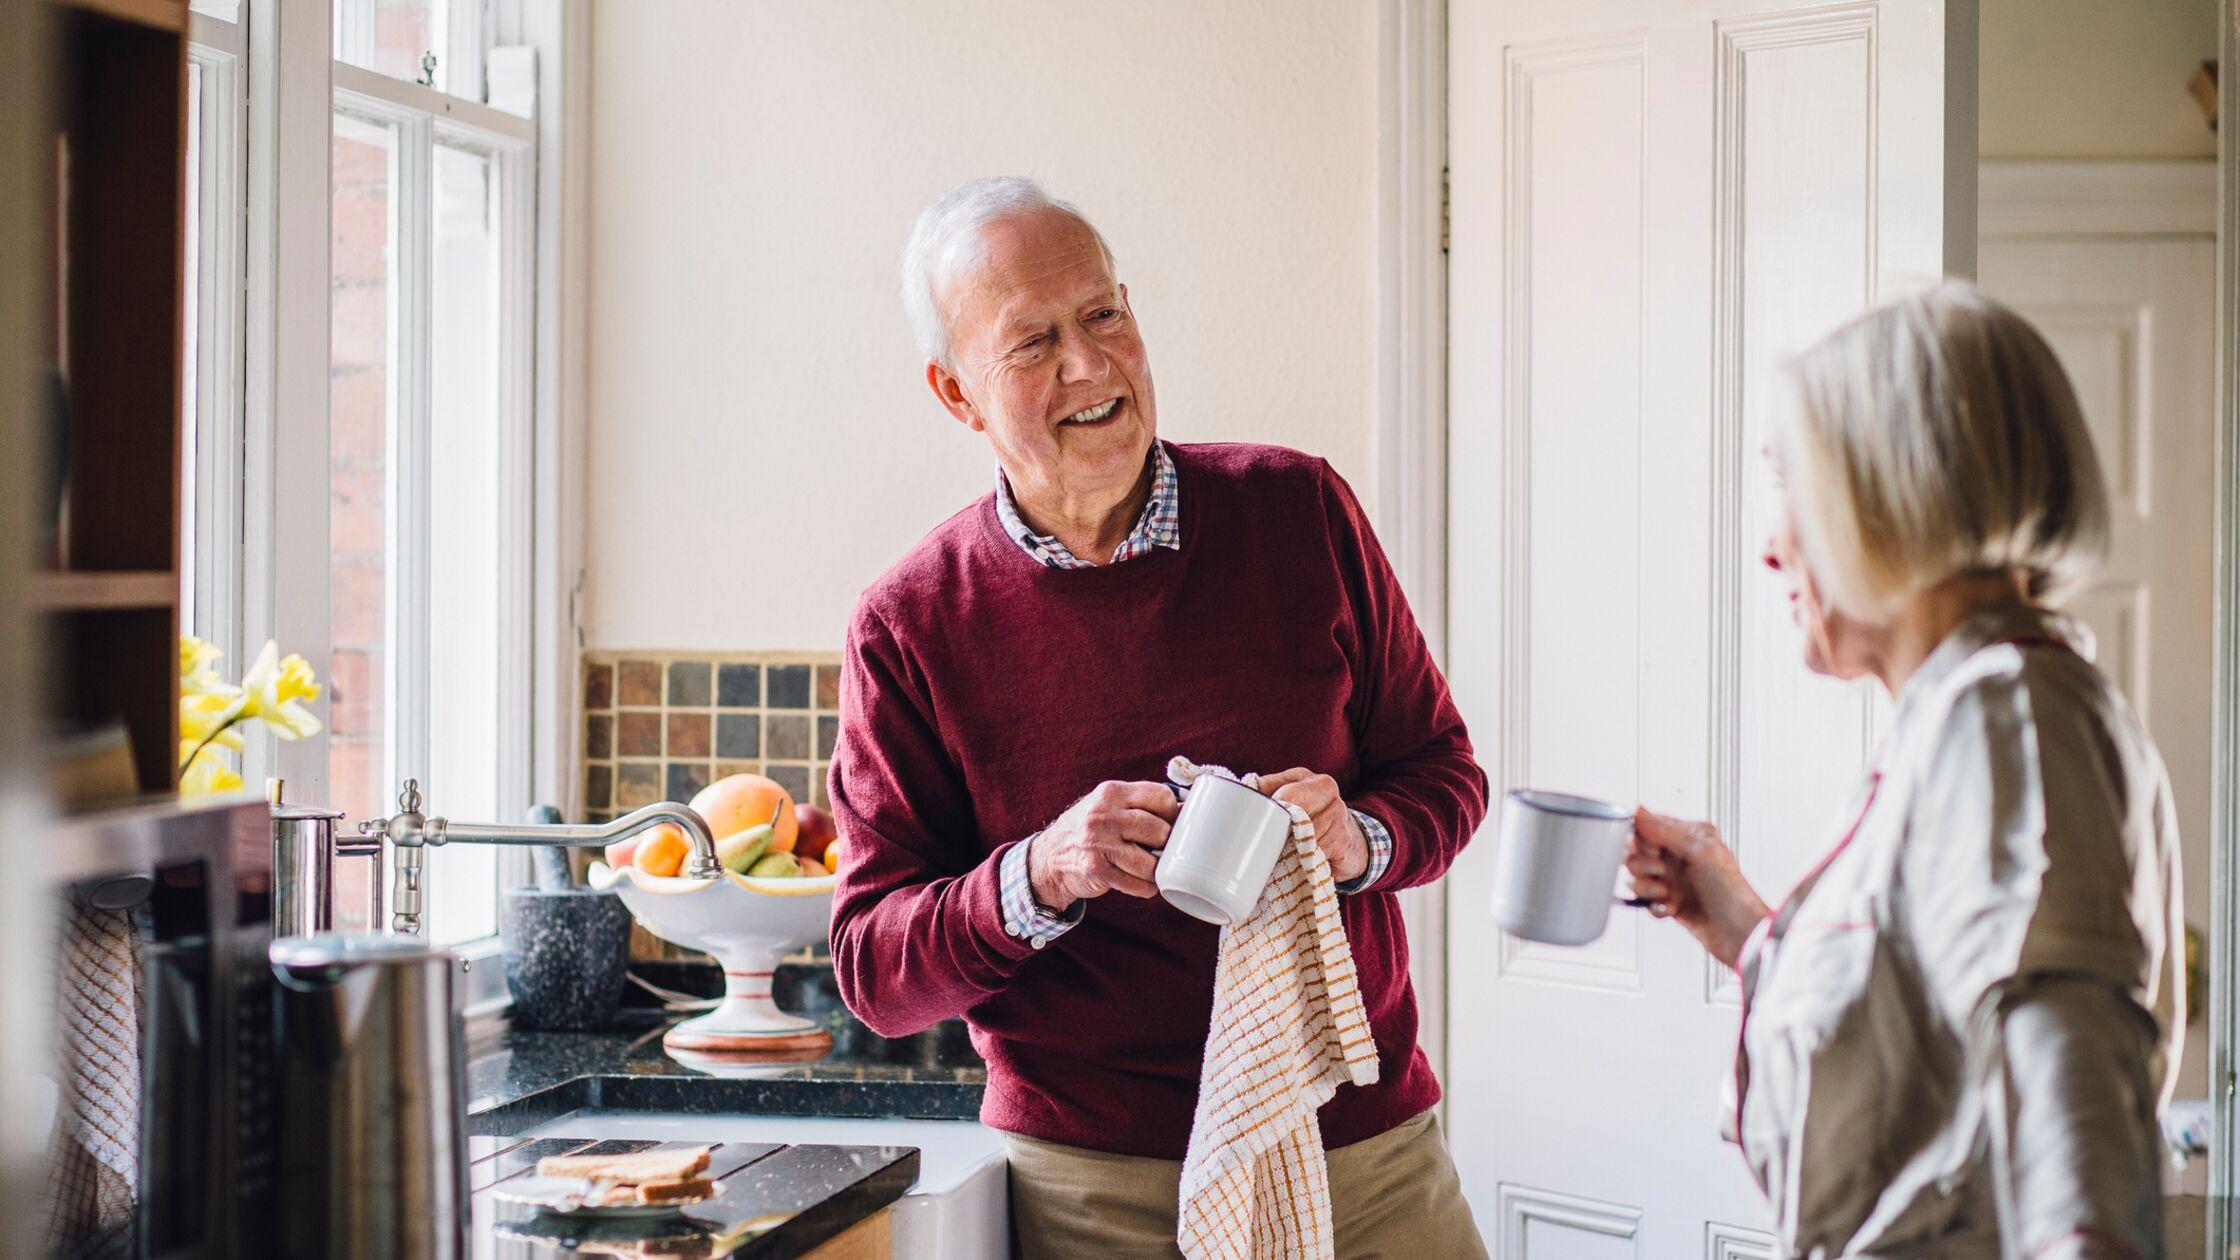 Älterer Mann trocknet Kaffeebecher mit kariertem Geschirrtuch ab